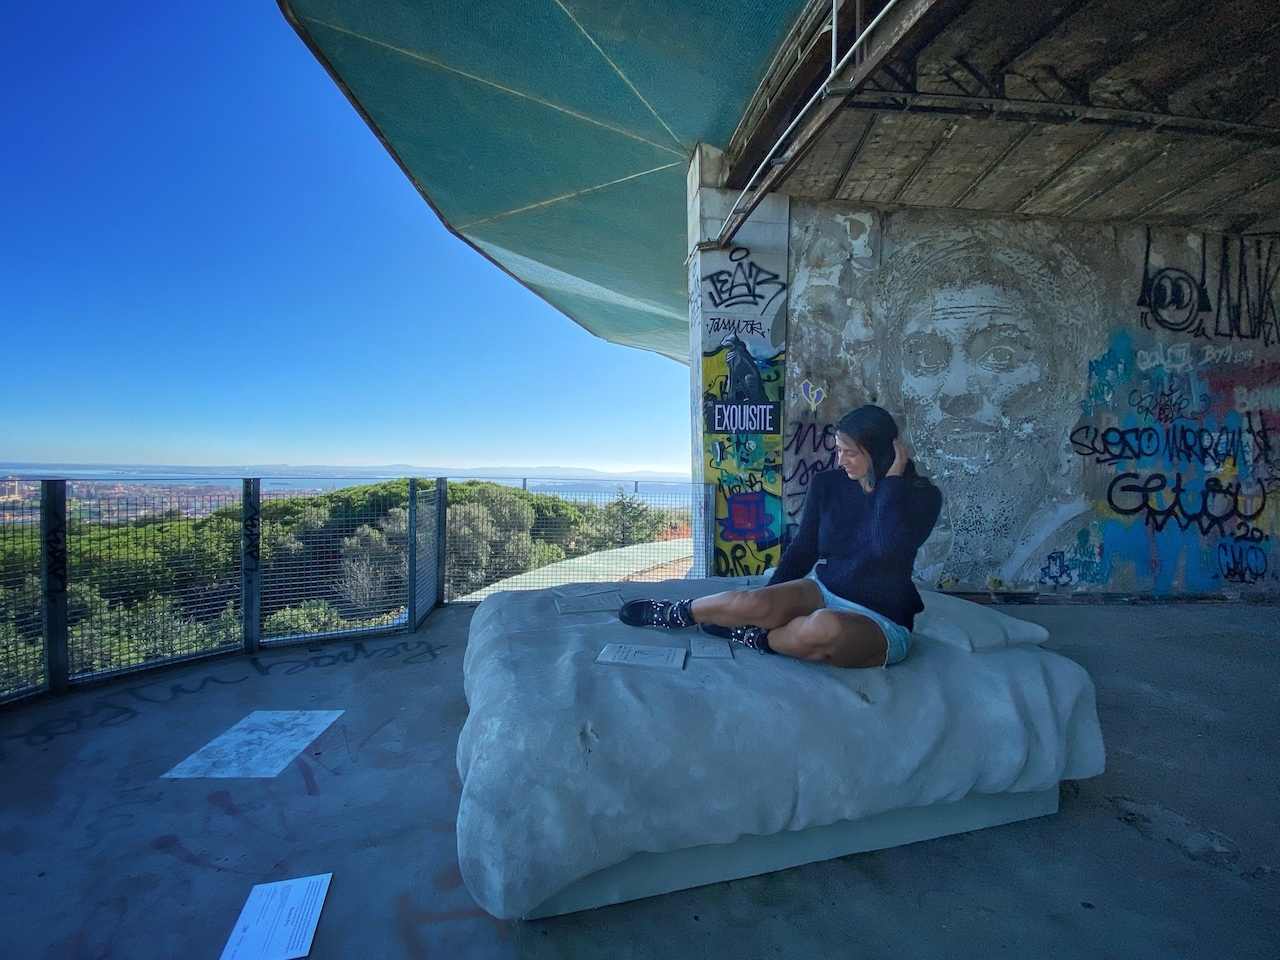 panoramico de monsanto vhils